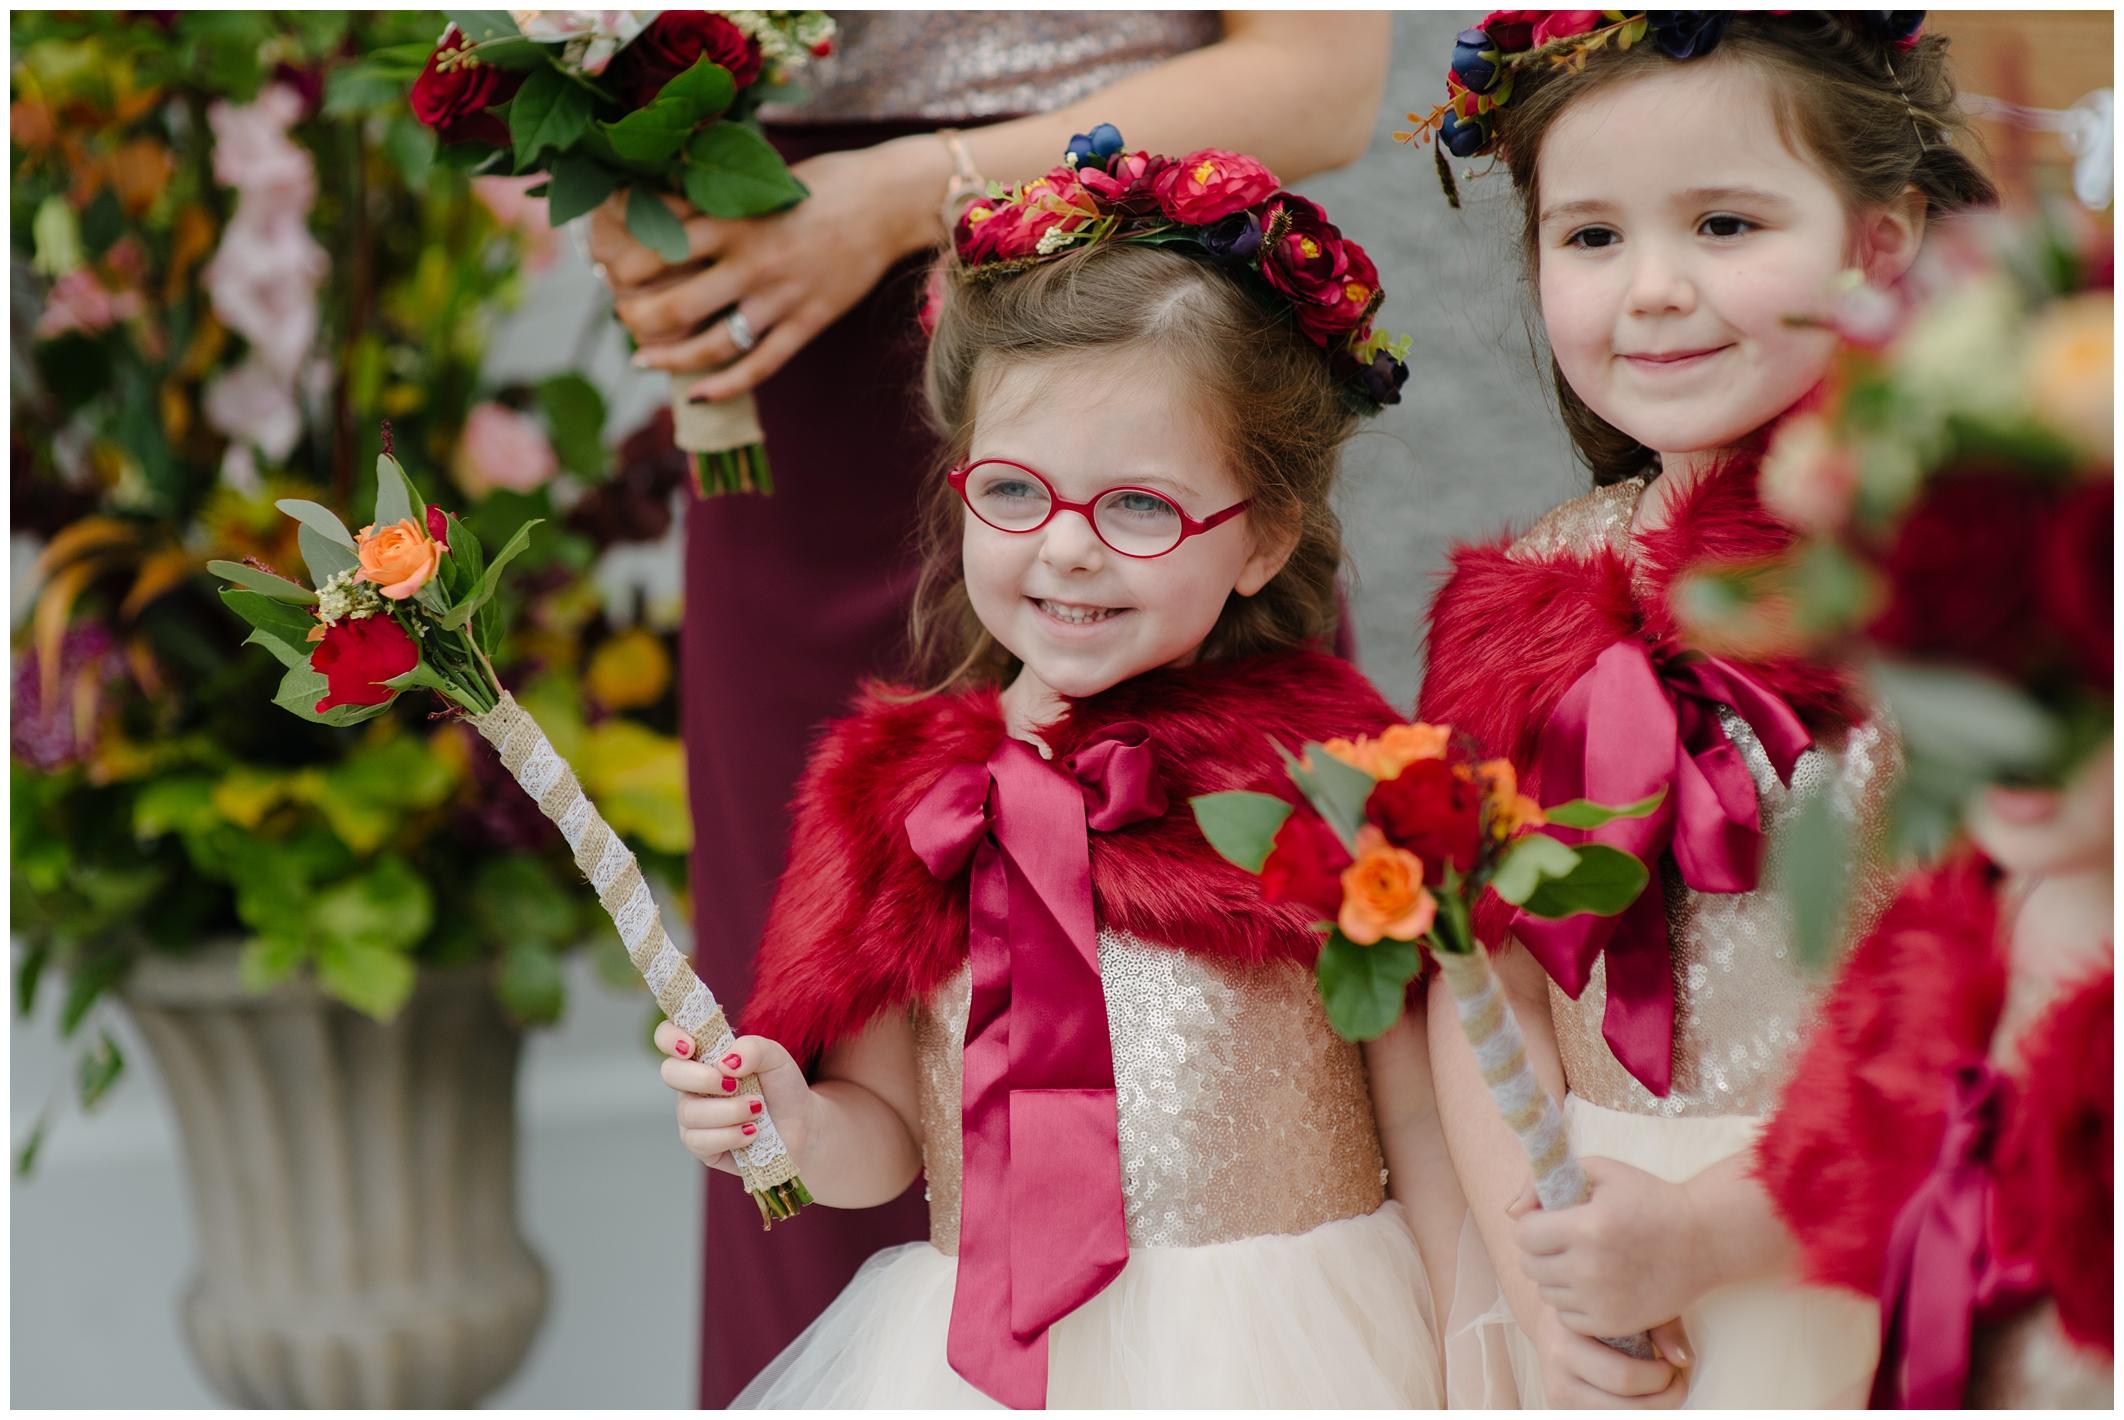 tracey_conor__wedding_jude_browne_photography_0018.jpg